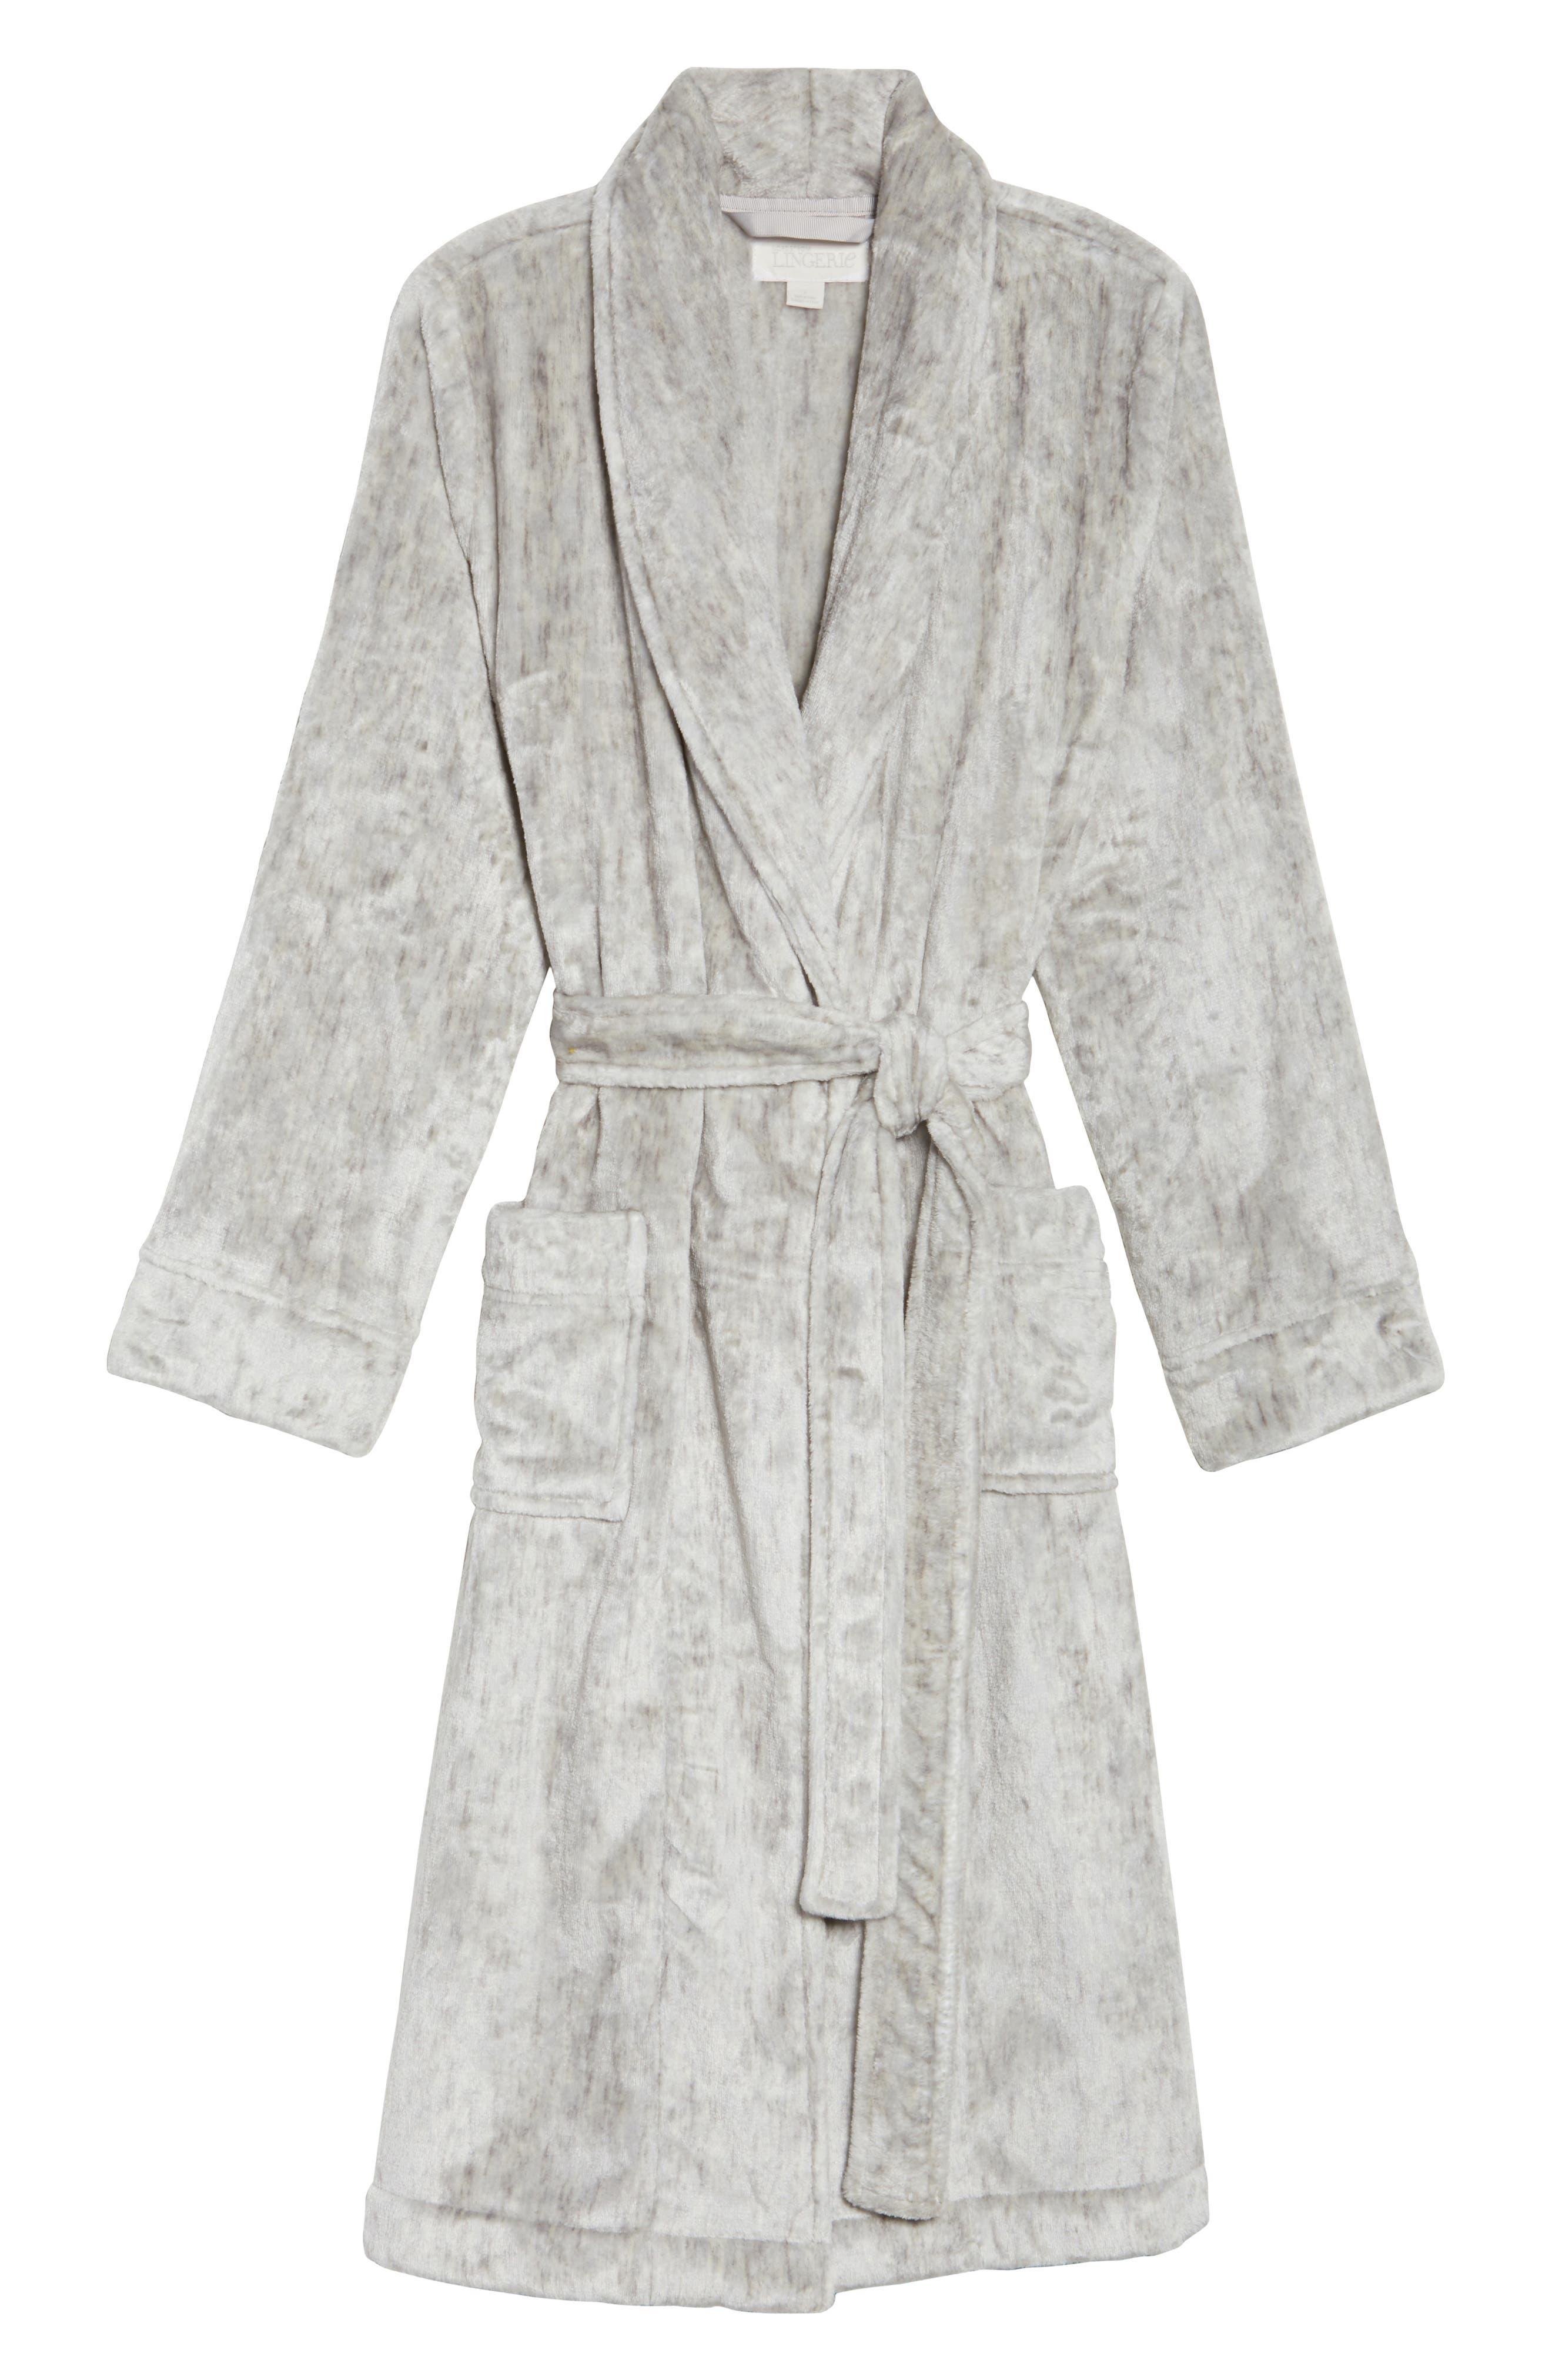 Nordstrom So Soft Plush Robe,                             Alternate thumbnail 16, color,